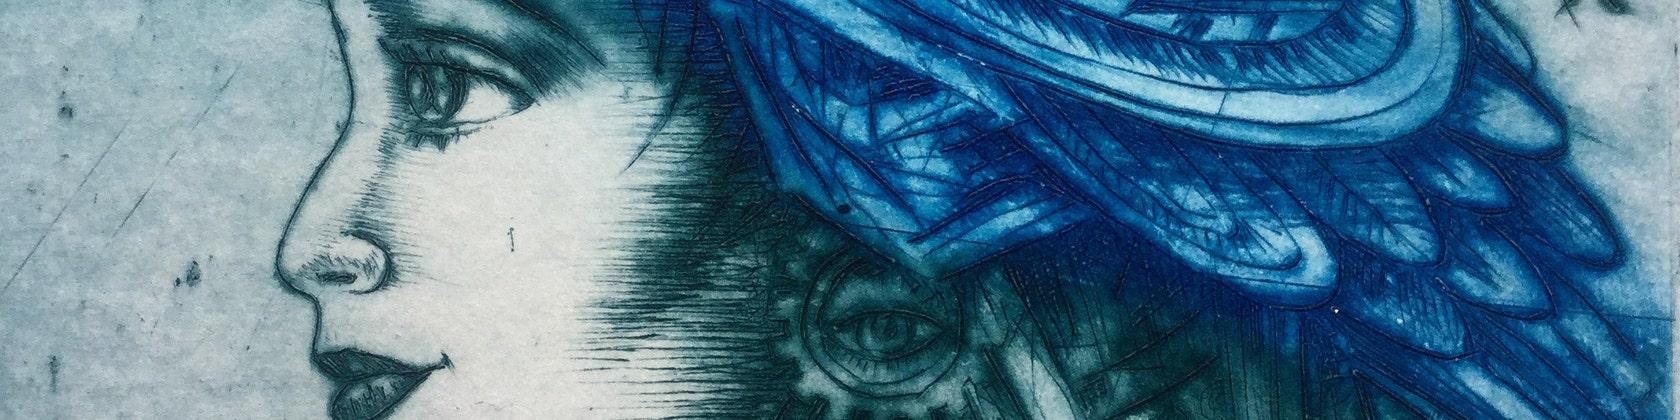 Ballade original artwork dry point engraving limited edition intaglio print